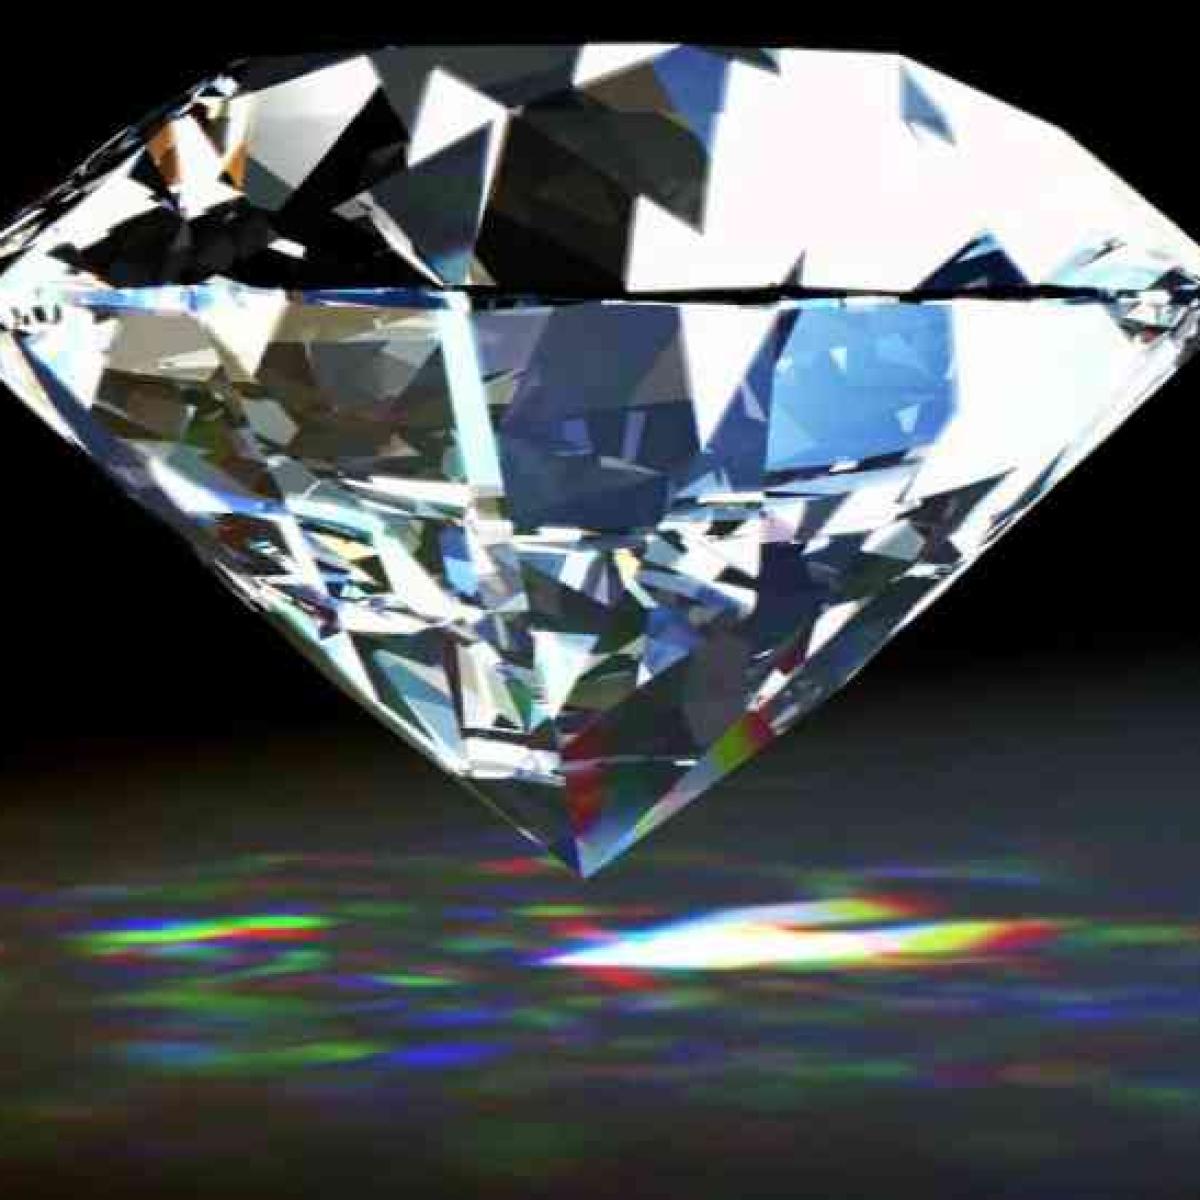 Bhopal: NMDC, Adani, Birla bid for Bunder diamond mine